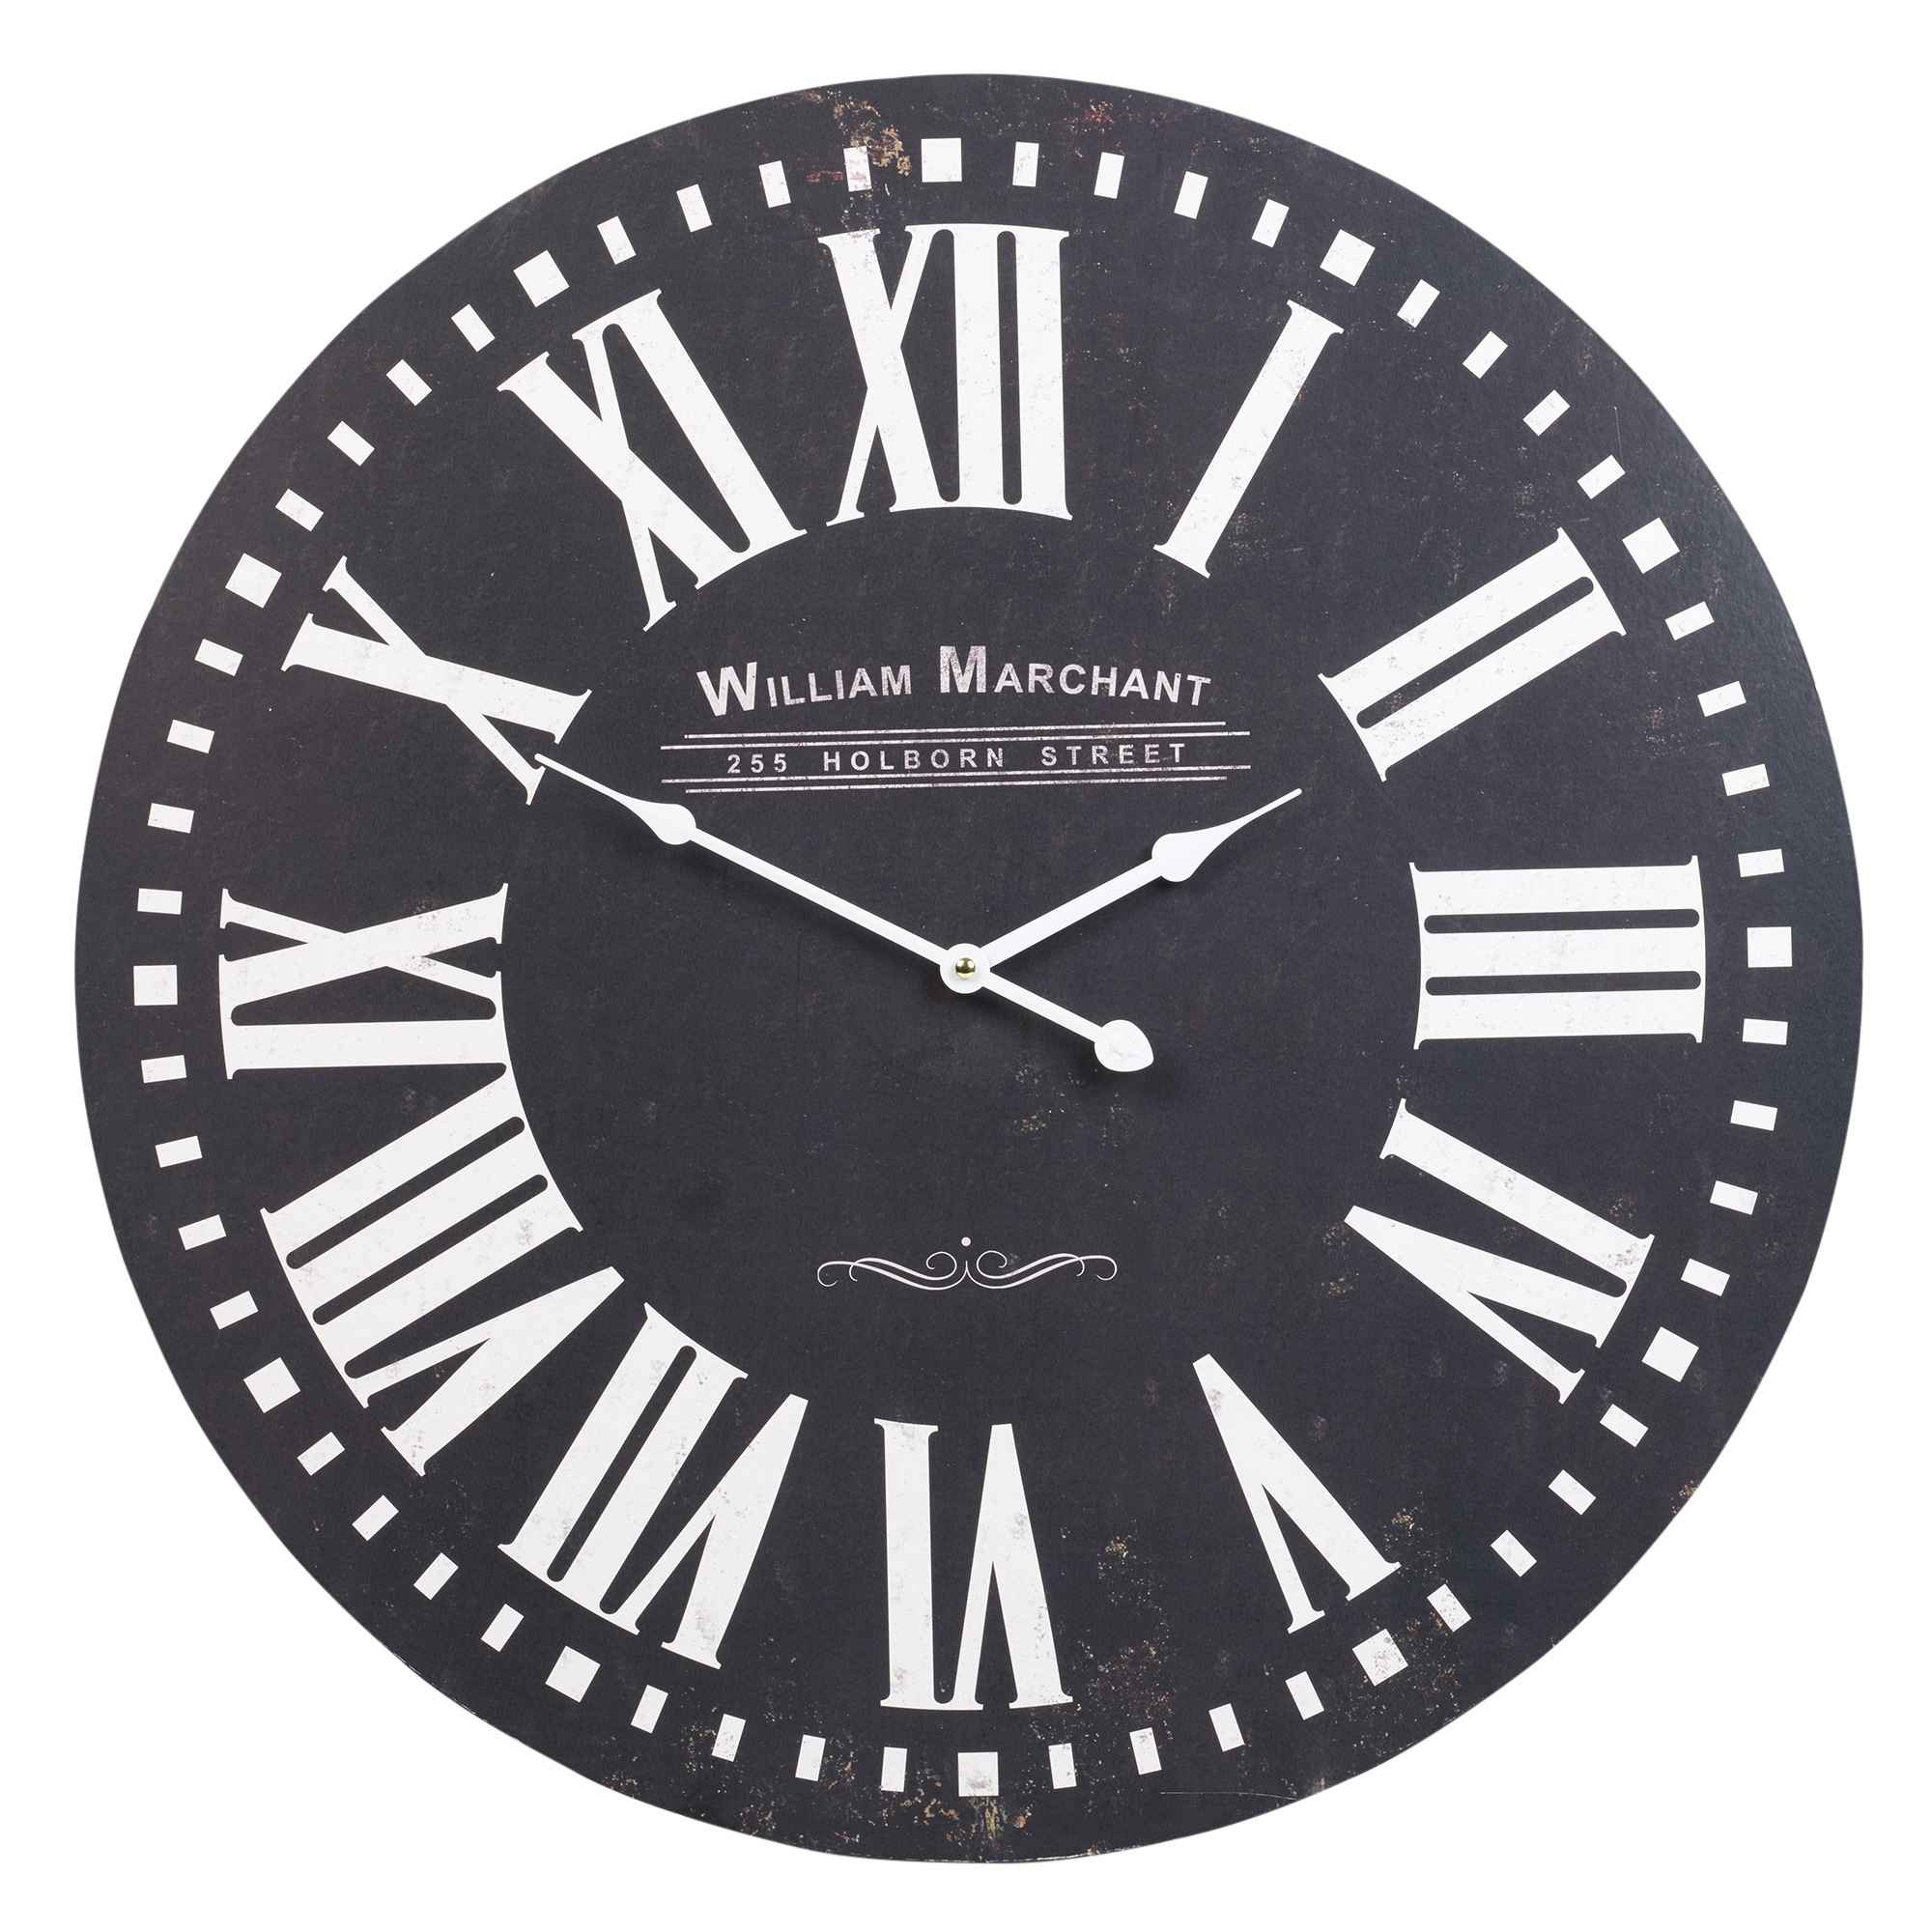 60cm extra large round wooden wall clock vintage retro. Black Bedroom Furniture Sets. Home Design Ideas